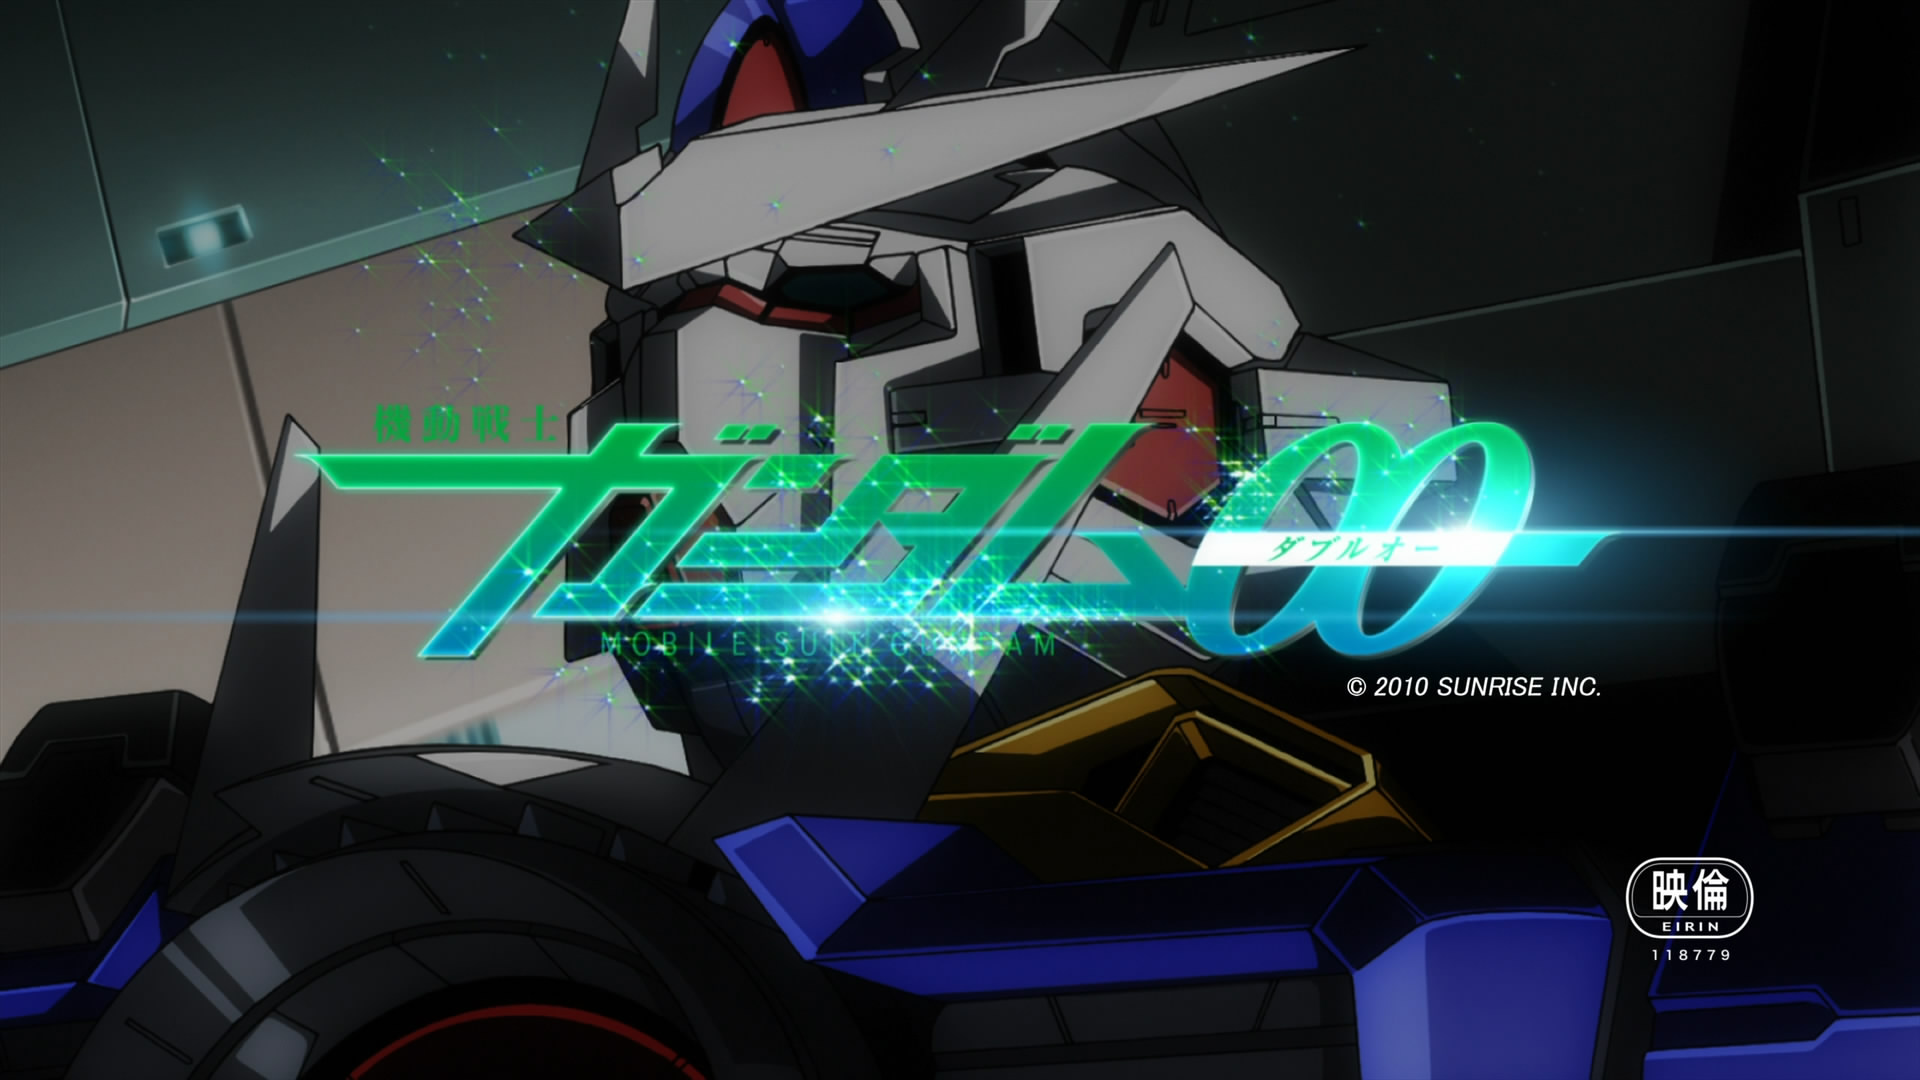 [gSS]_Mobile_Suit_Gundam_00_-_A_wakening_of_the_Trailblazer_(1080p)_[2B252856].mkv_snapshot_00.02.28_[2011.01.07_03.56.32]